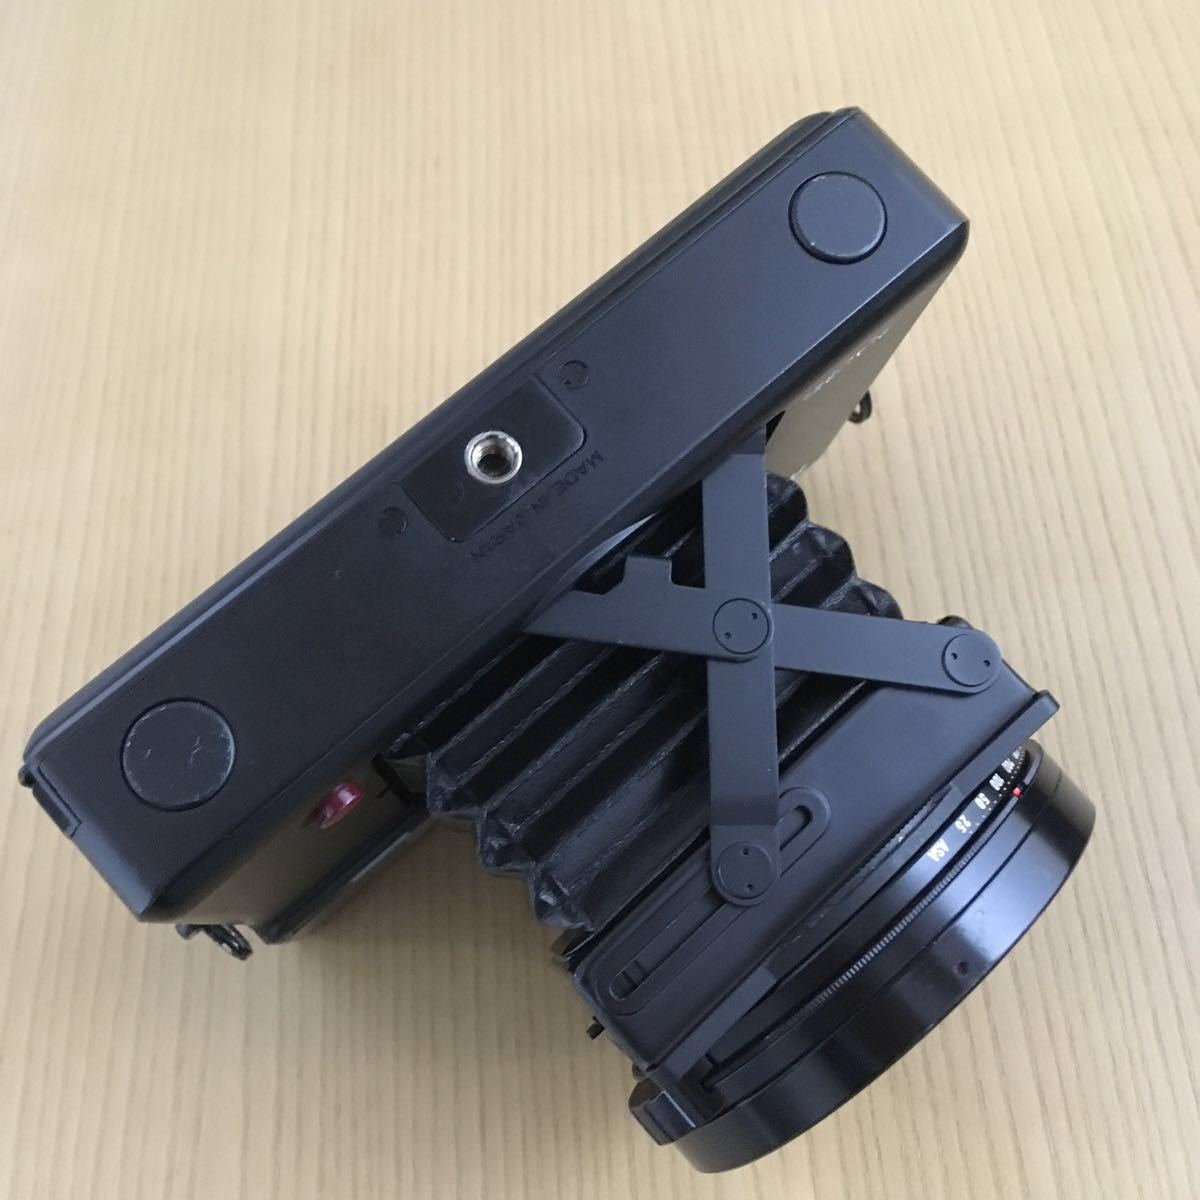 PLAUBEL makina 67 (Nikon Nikkor 80mm f2.8)プラウベル・マキナ 中判カメラ 完動品 シャッター切れスピード変化し露出計も動作しました。_画像9